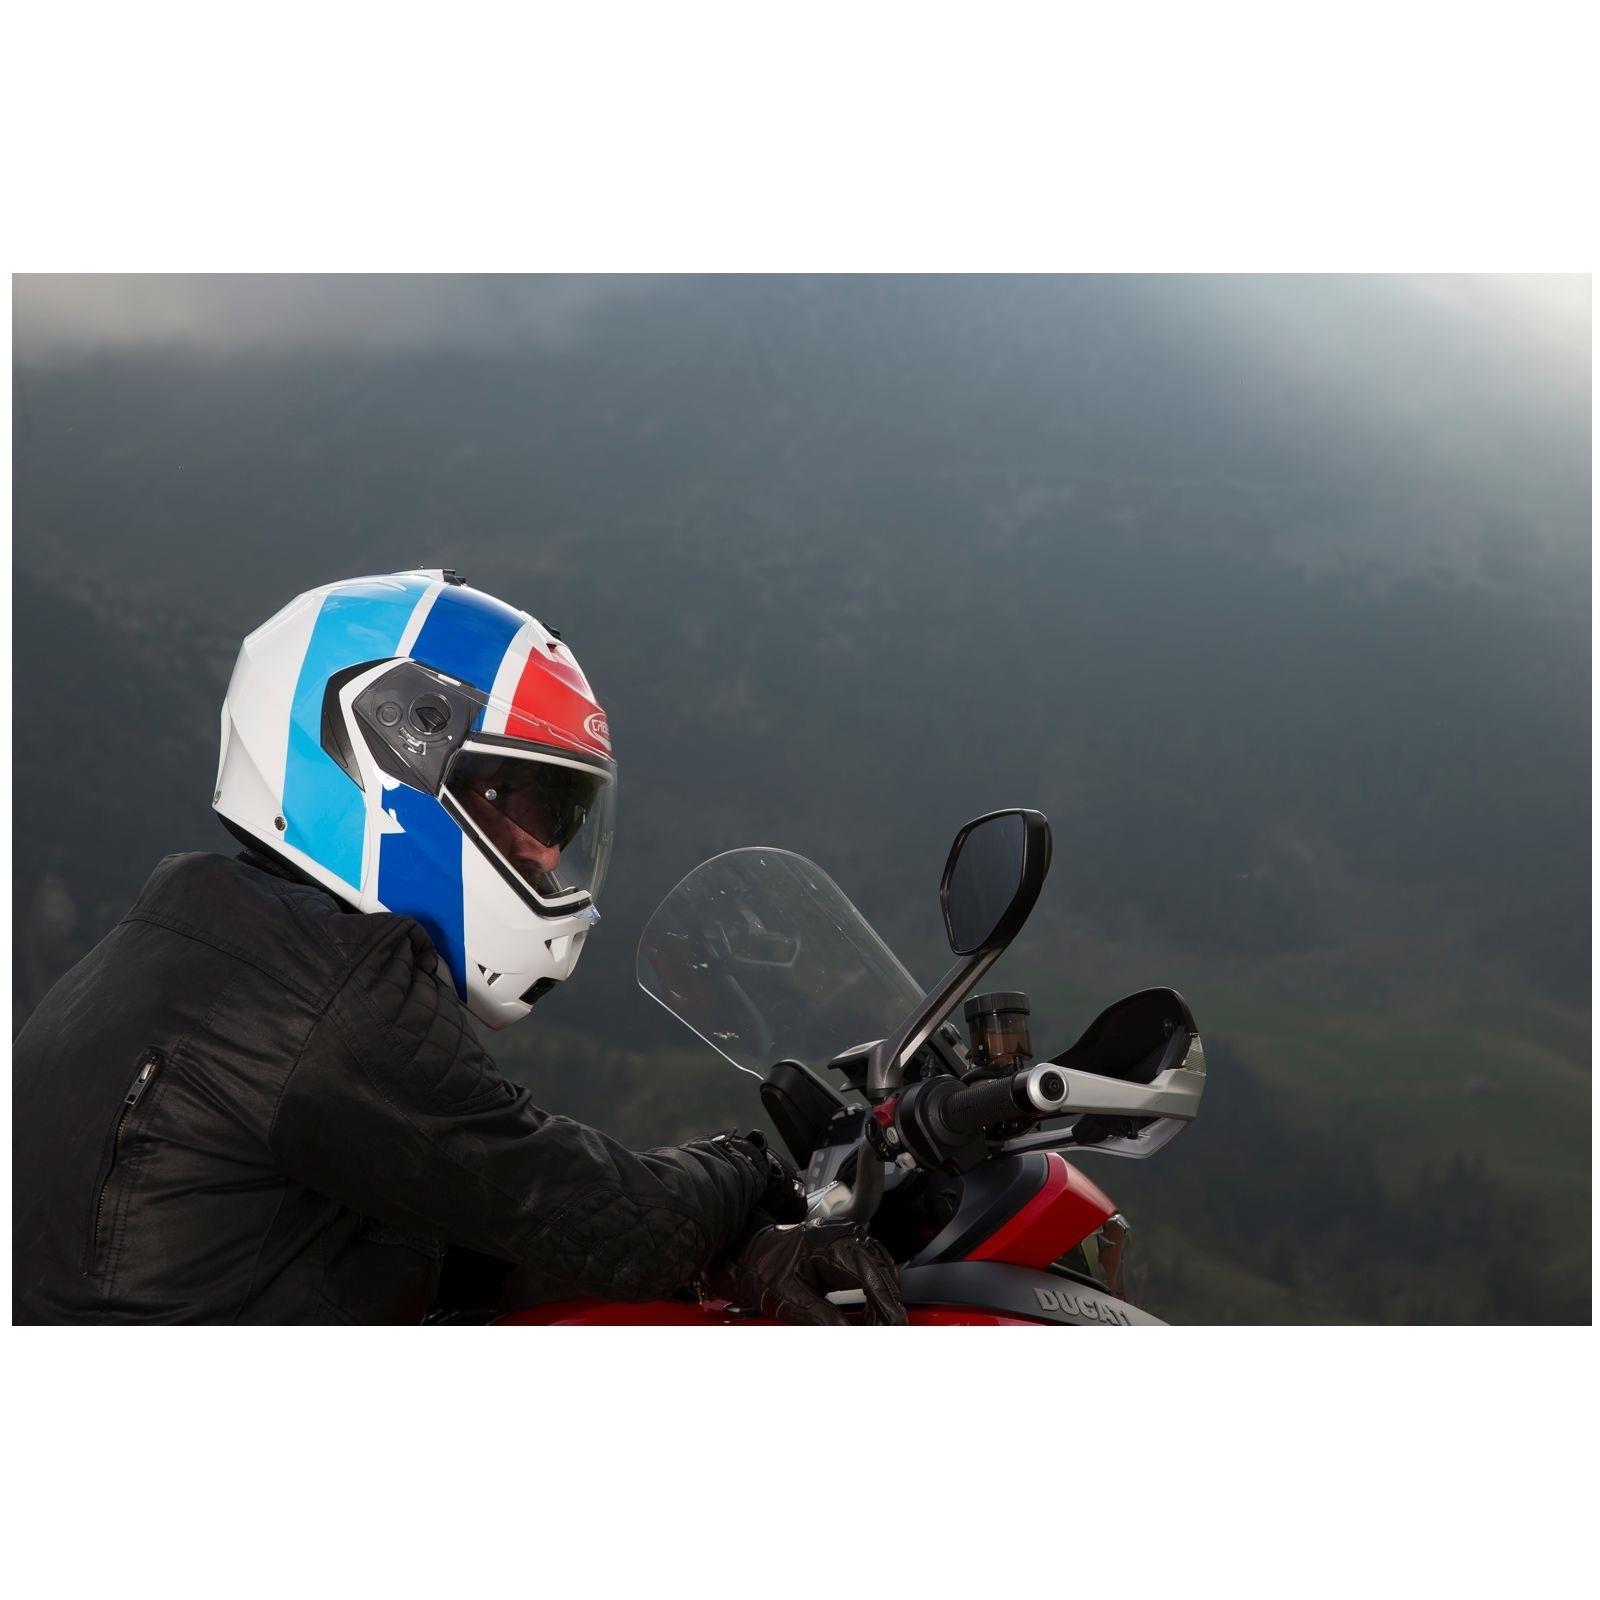 Caberg-Klapp-Helm-Duke-II-2-Motorrad-Belueftet-Sonnenblende-Pinlock-Visier-Jet Indexbild 33